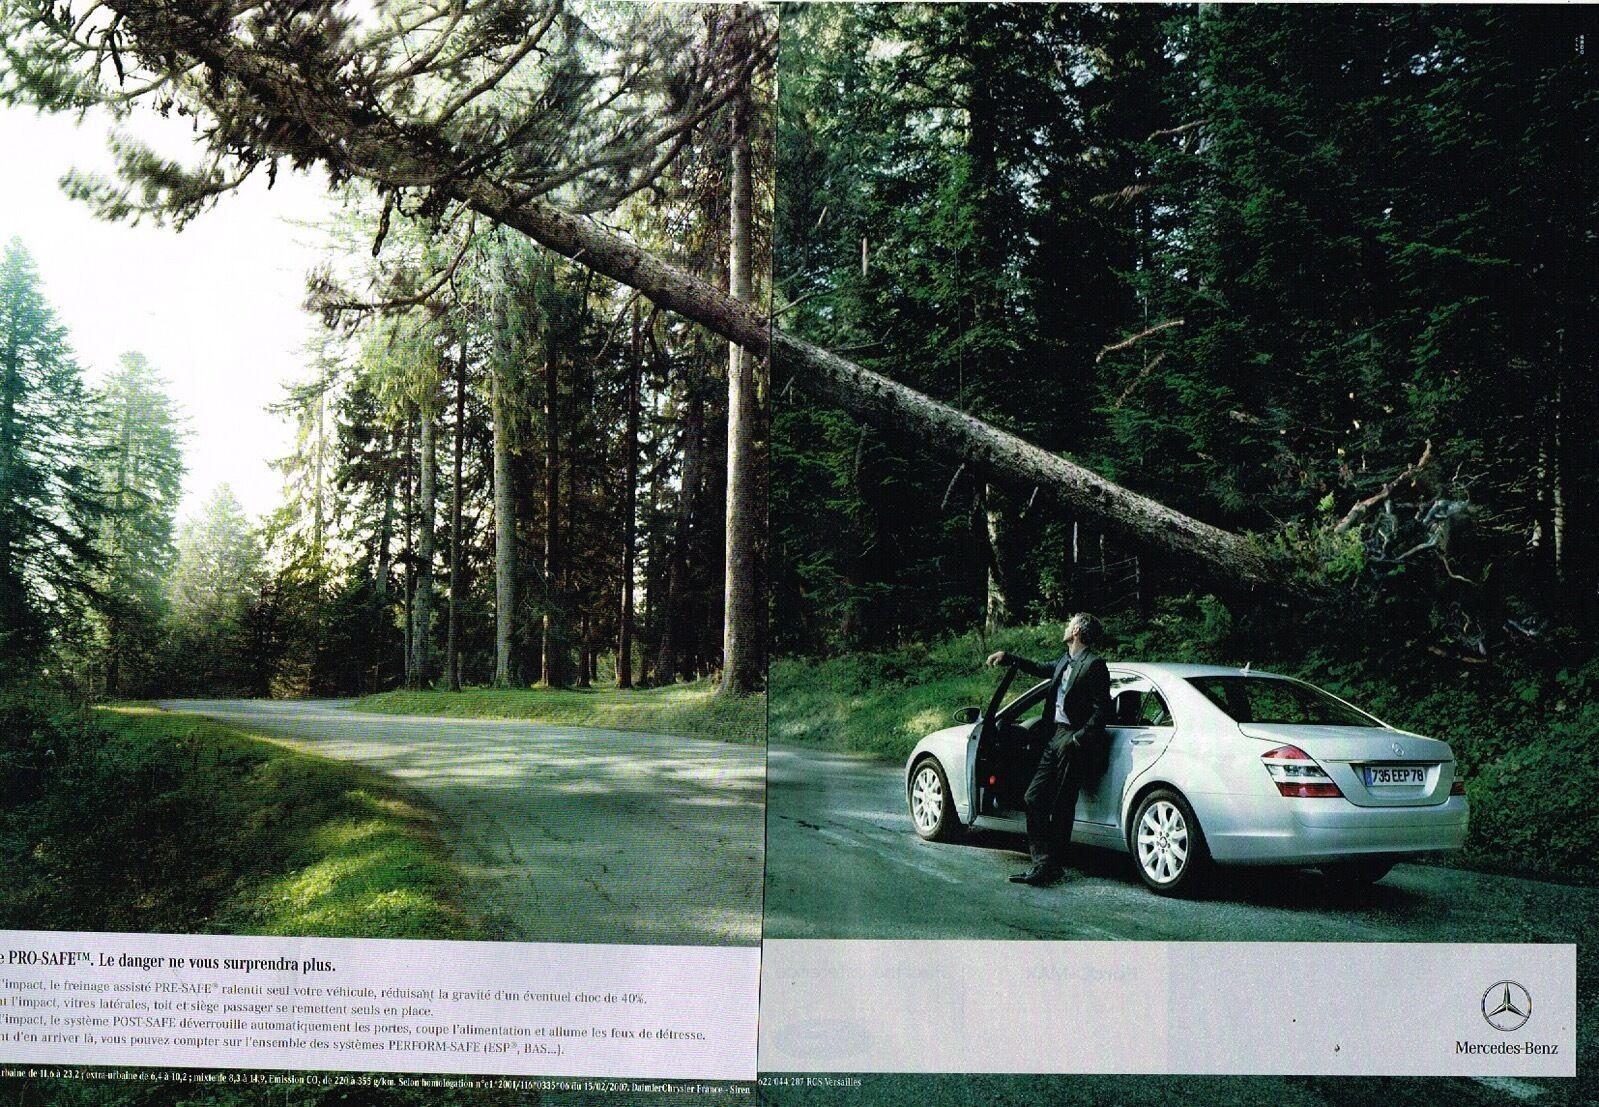 2007 Mercedes Benz Systeme Pro-Safe